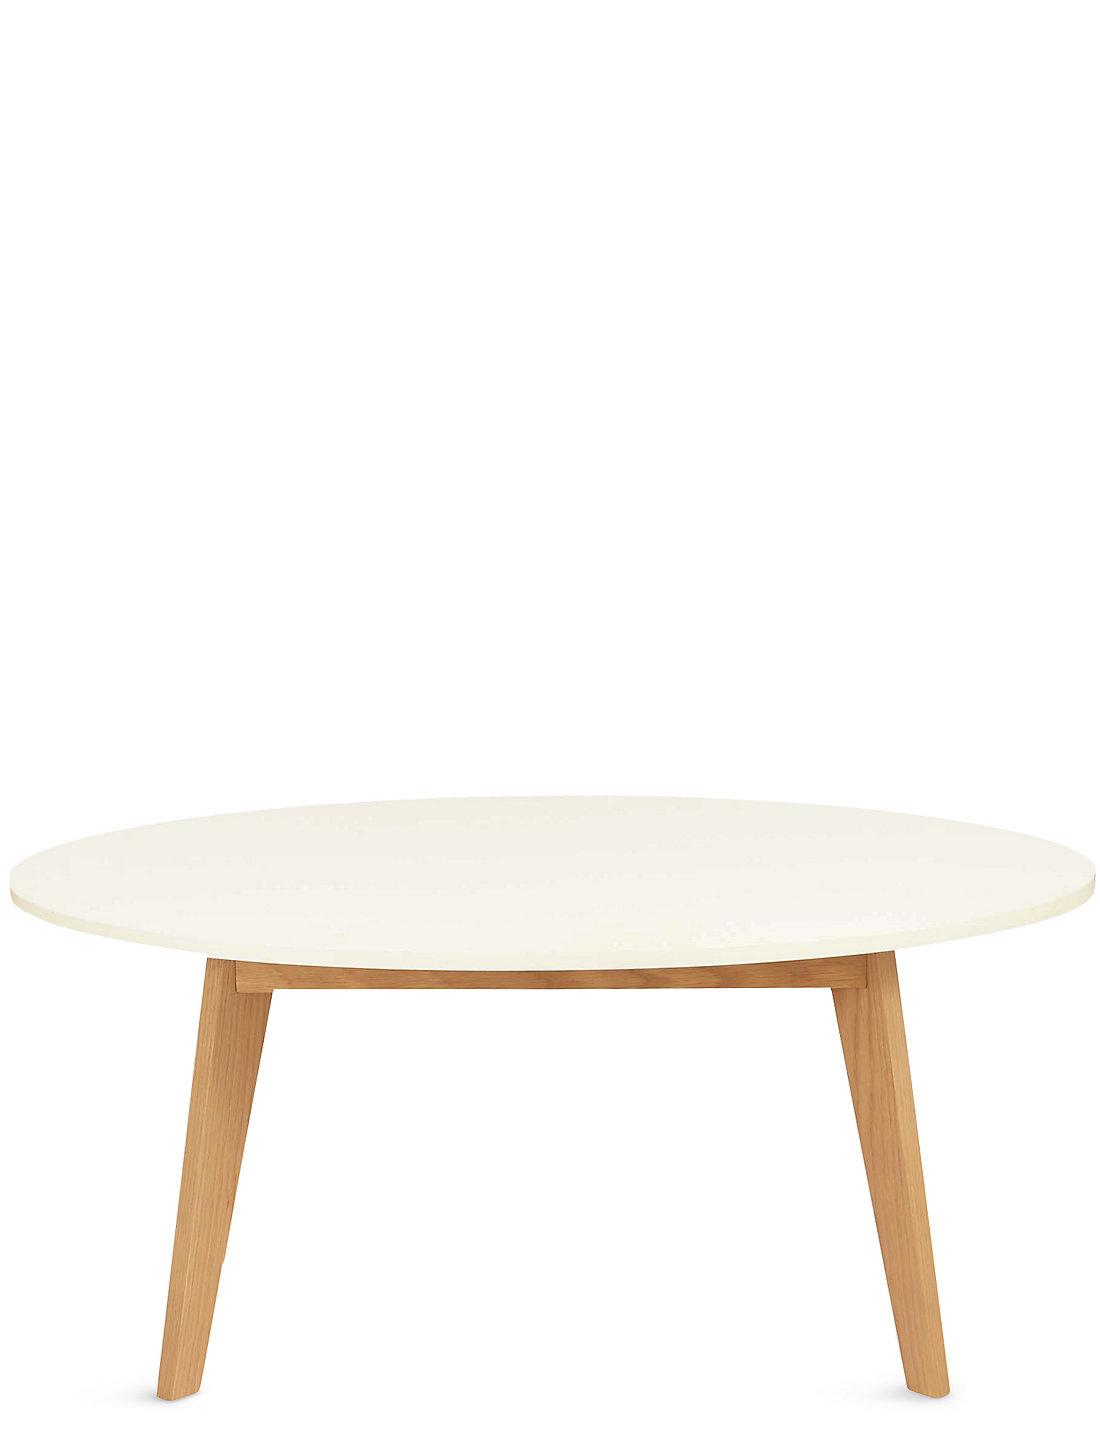 Bradshaw coffee table oval ms bradshaw coffee table oval geotapseo Choice Image